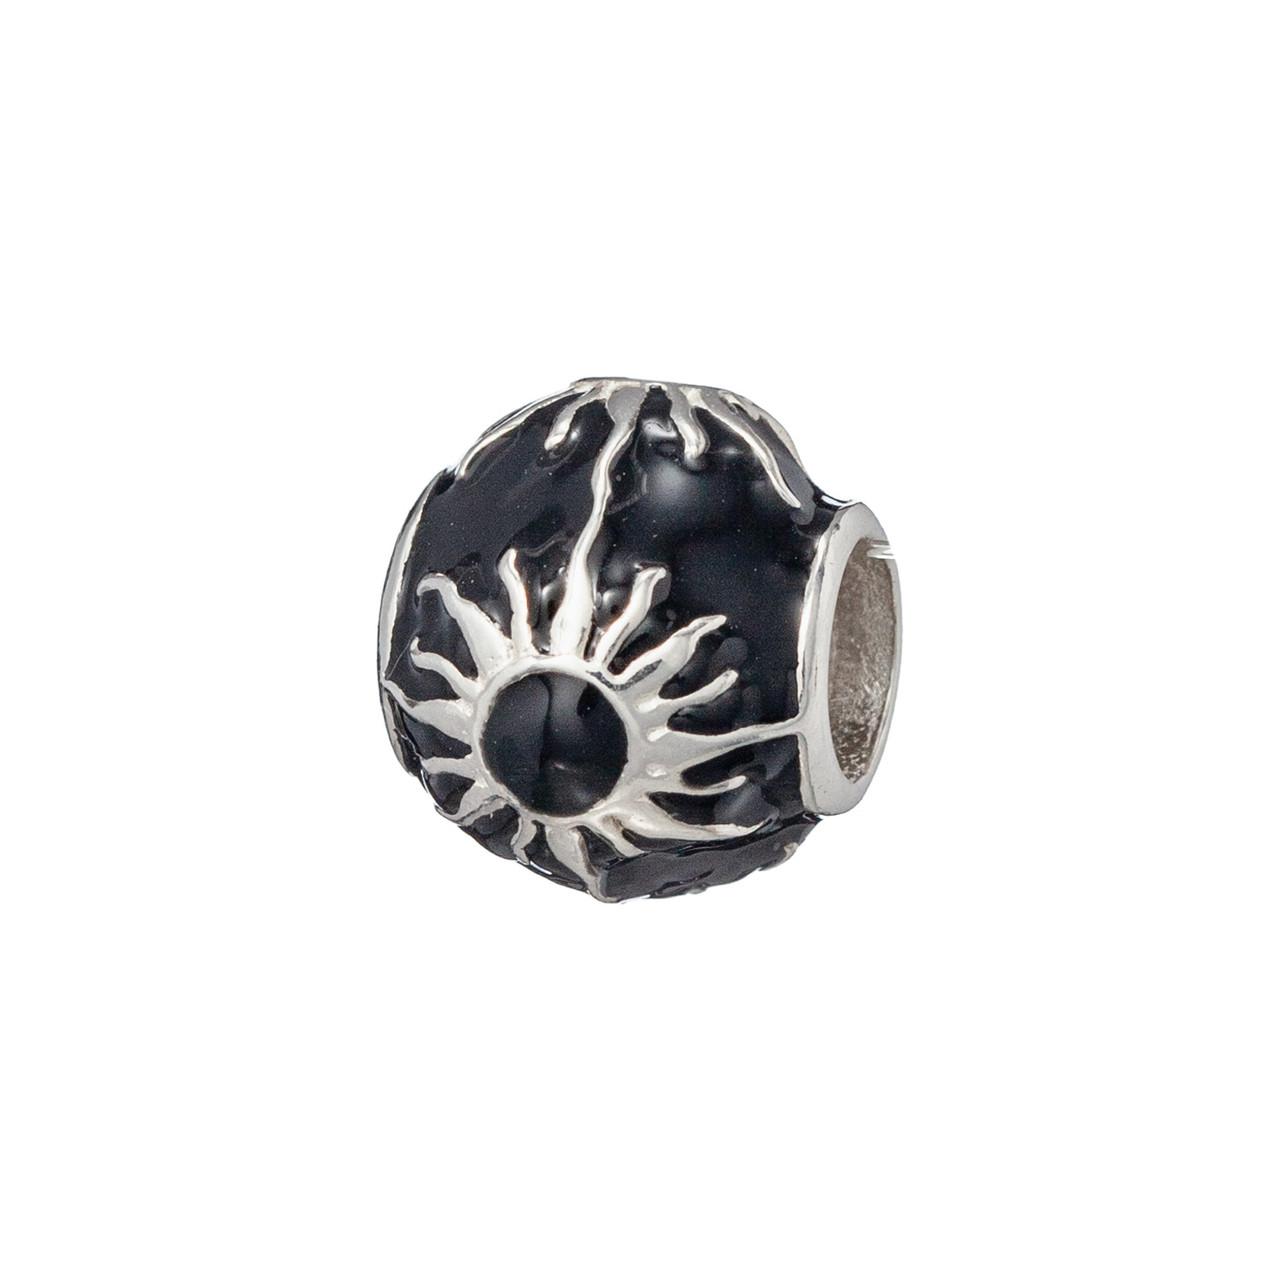 Шарм Brosh Jewellery (Серебро 925) Эмаль черная